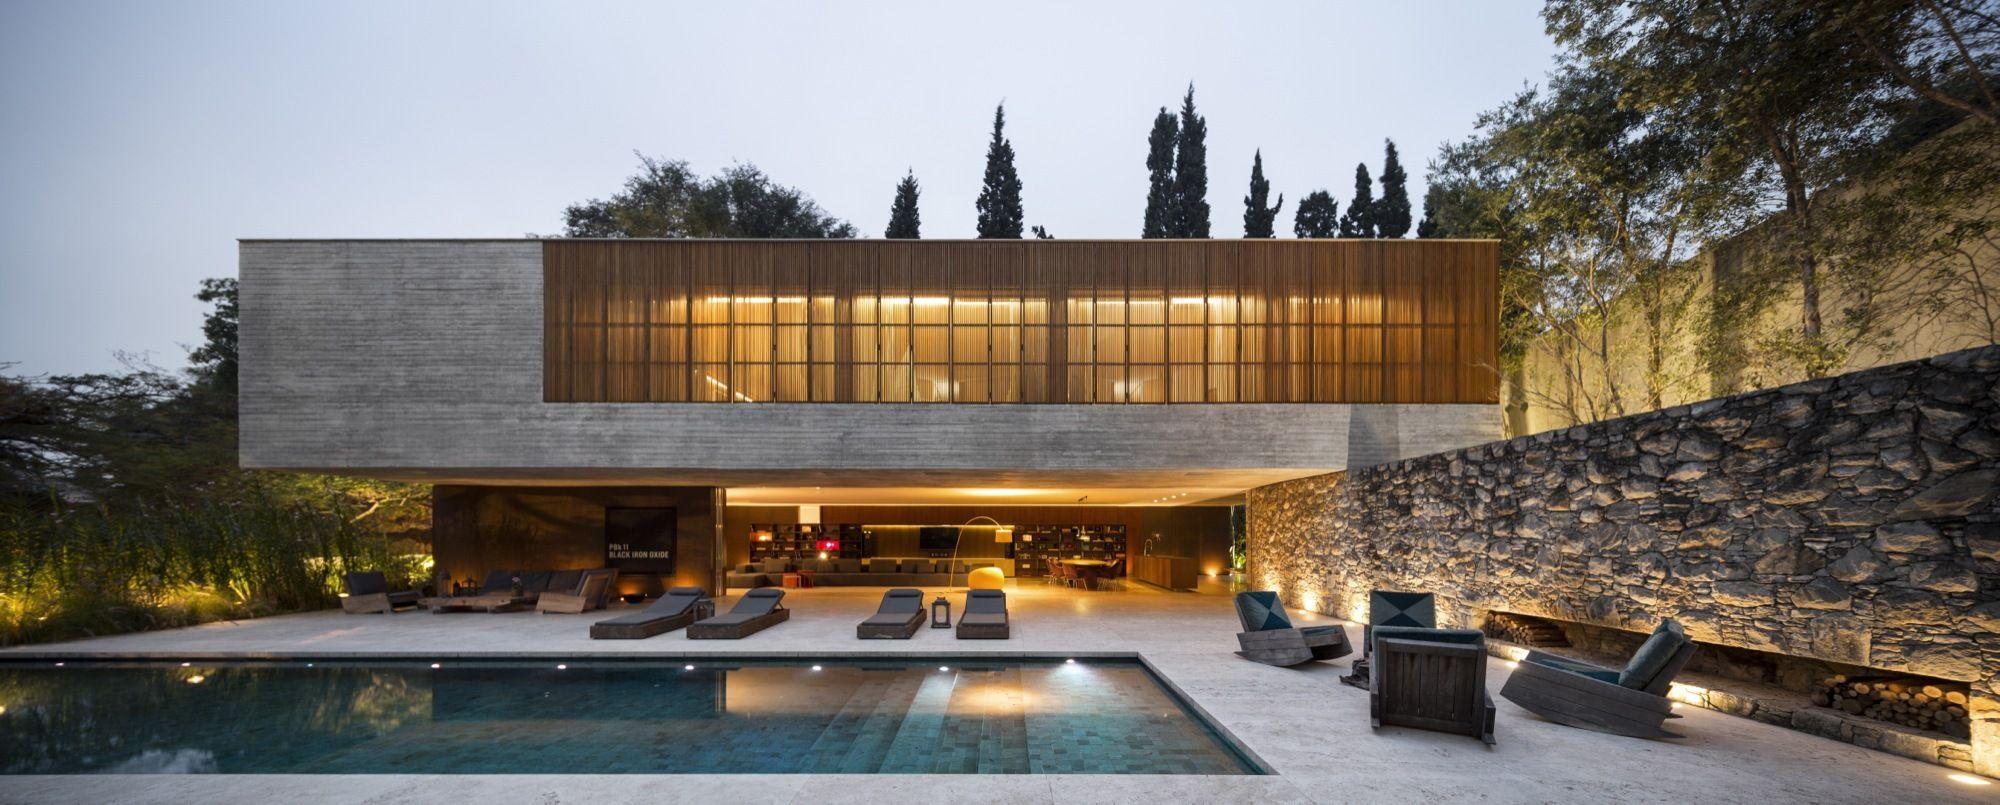 Open layout house concept by studio mk27 - Gallery Of Ipes House Studio Mk27 Marcio Kogan Lair Reis 2